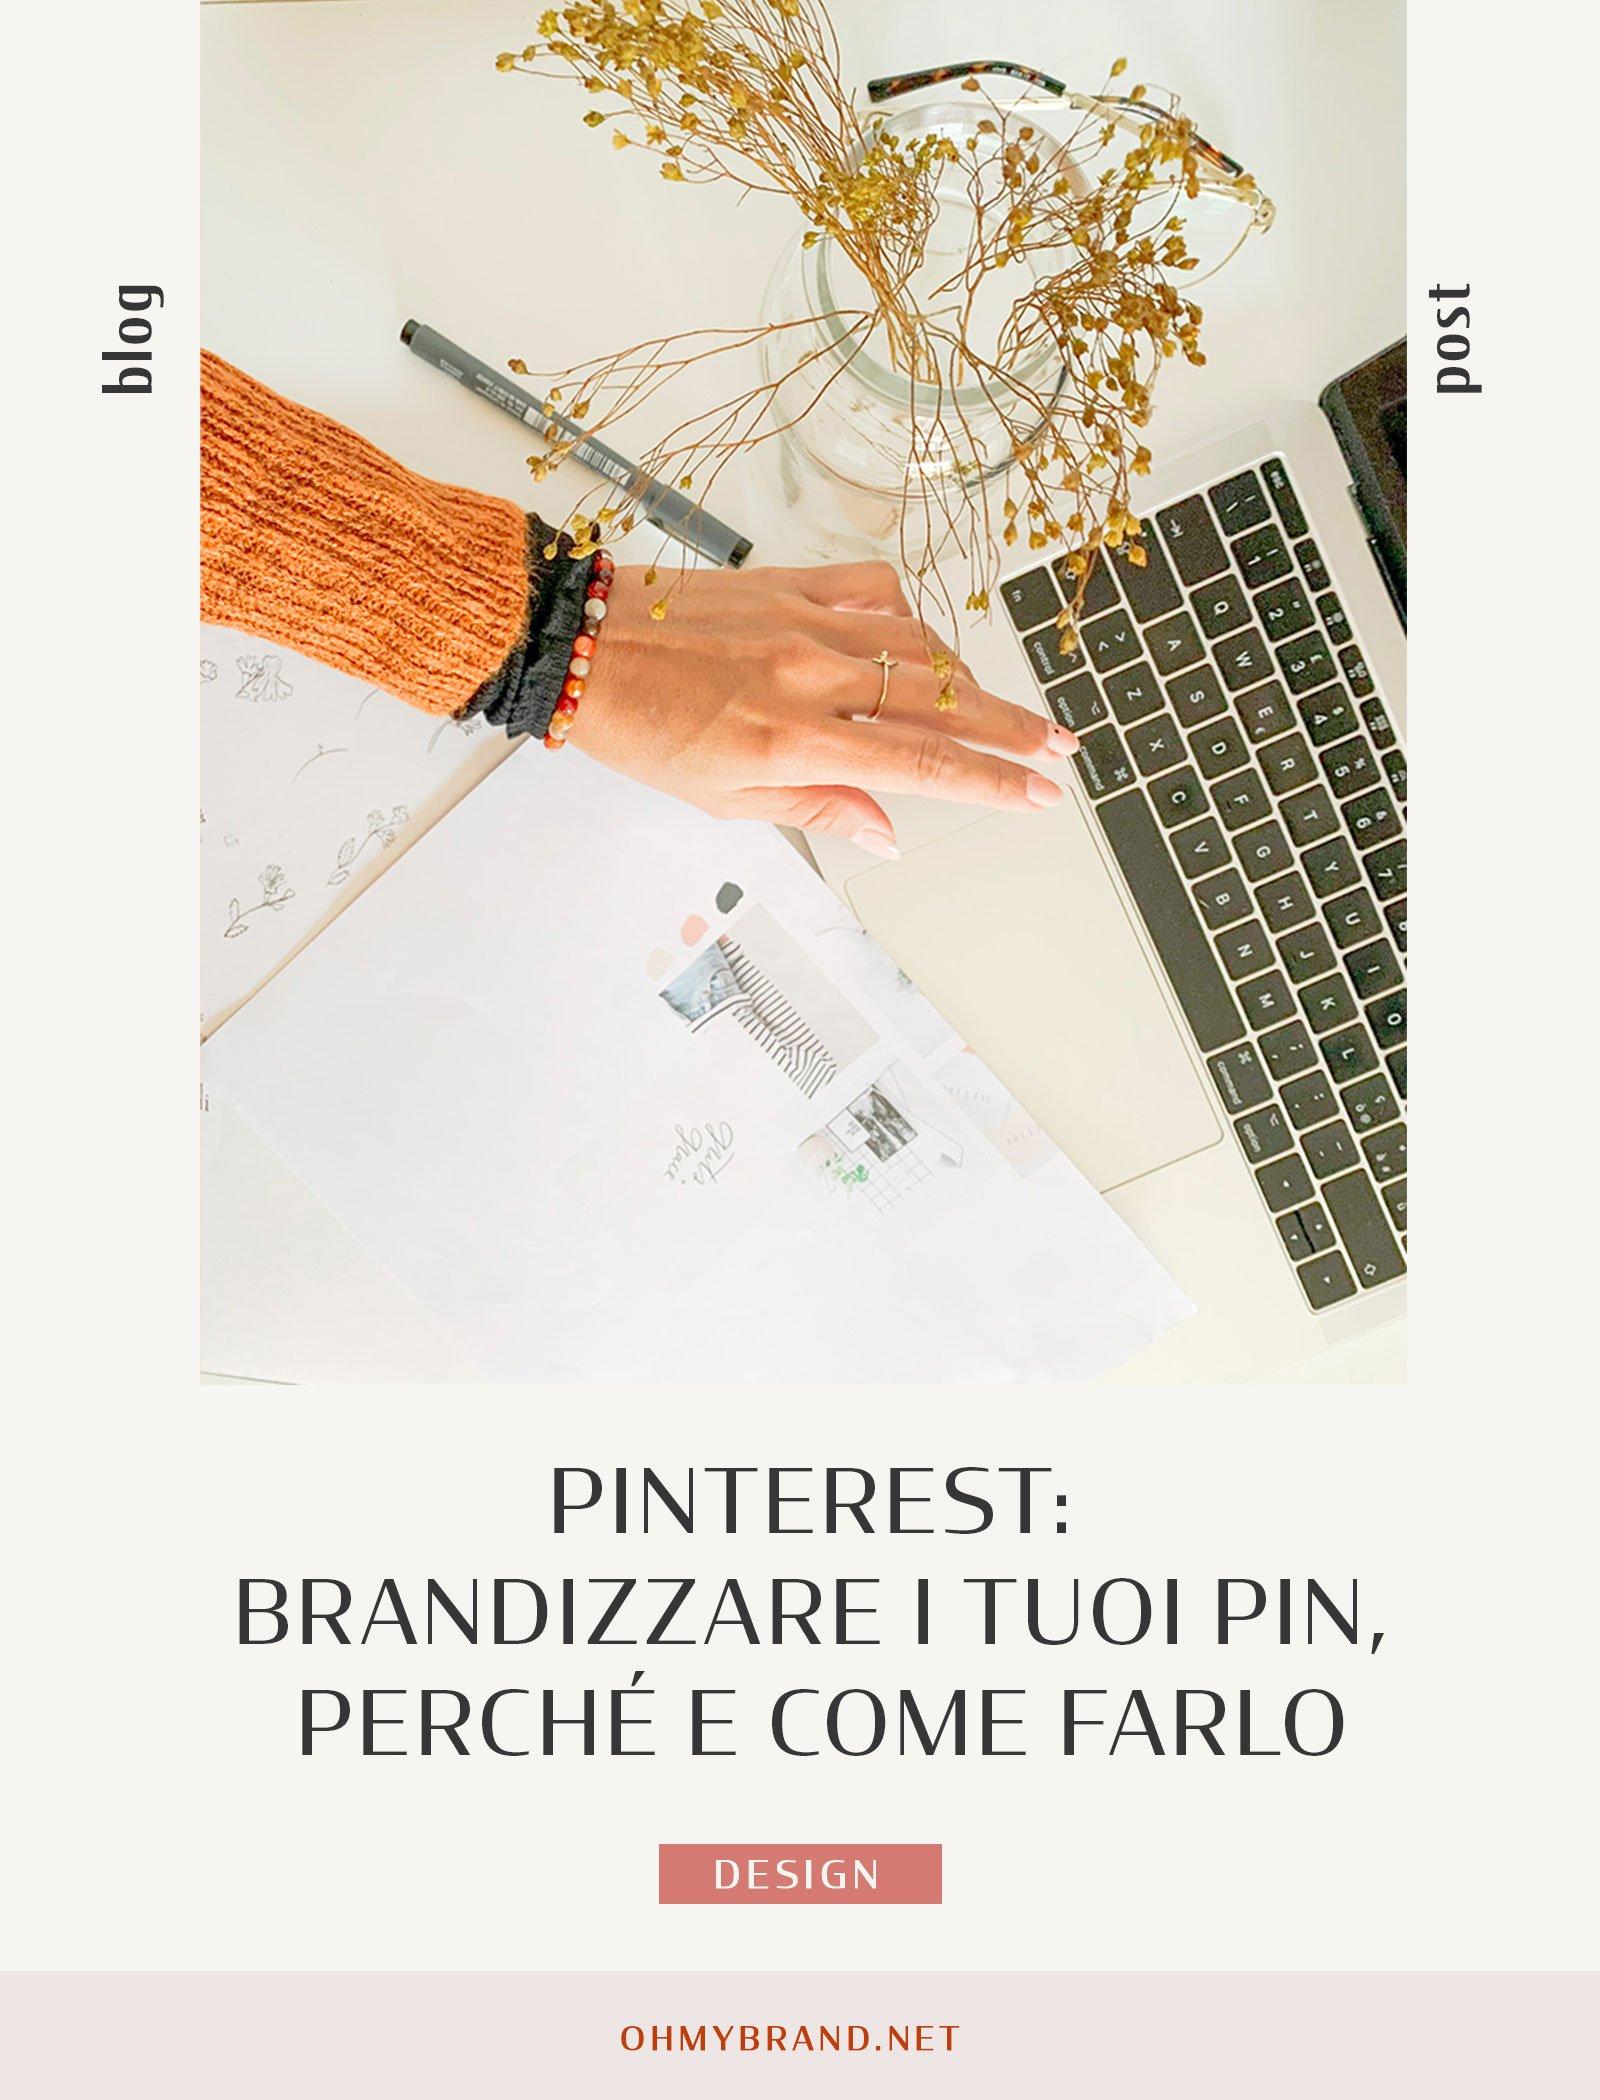 pin-brandizzare-pin-pinterest